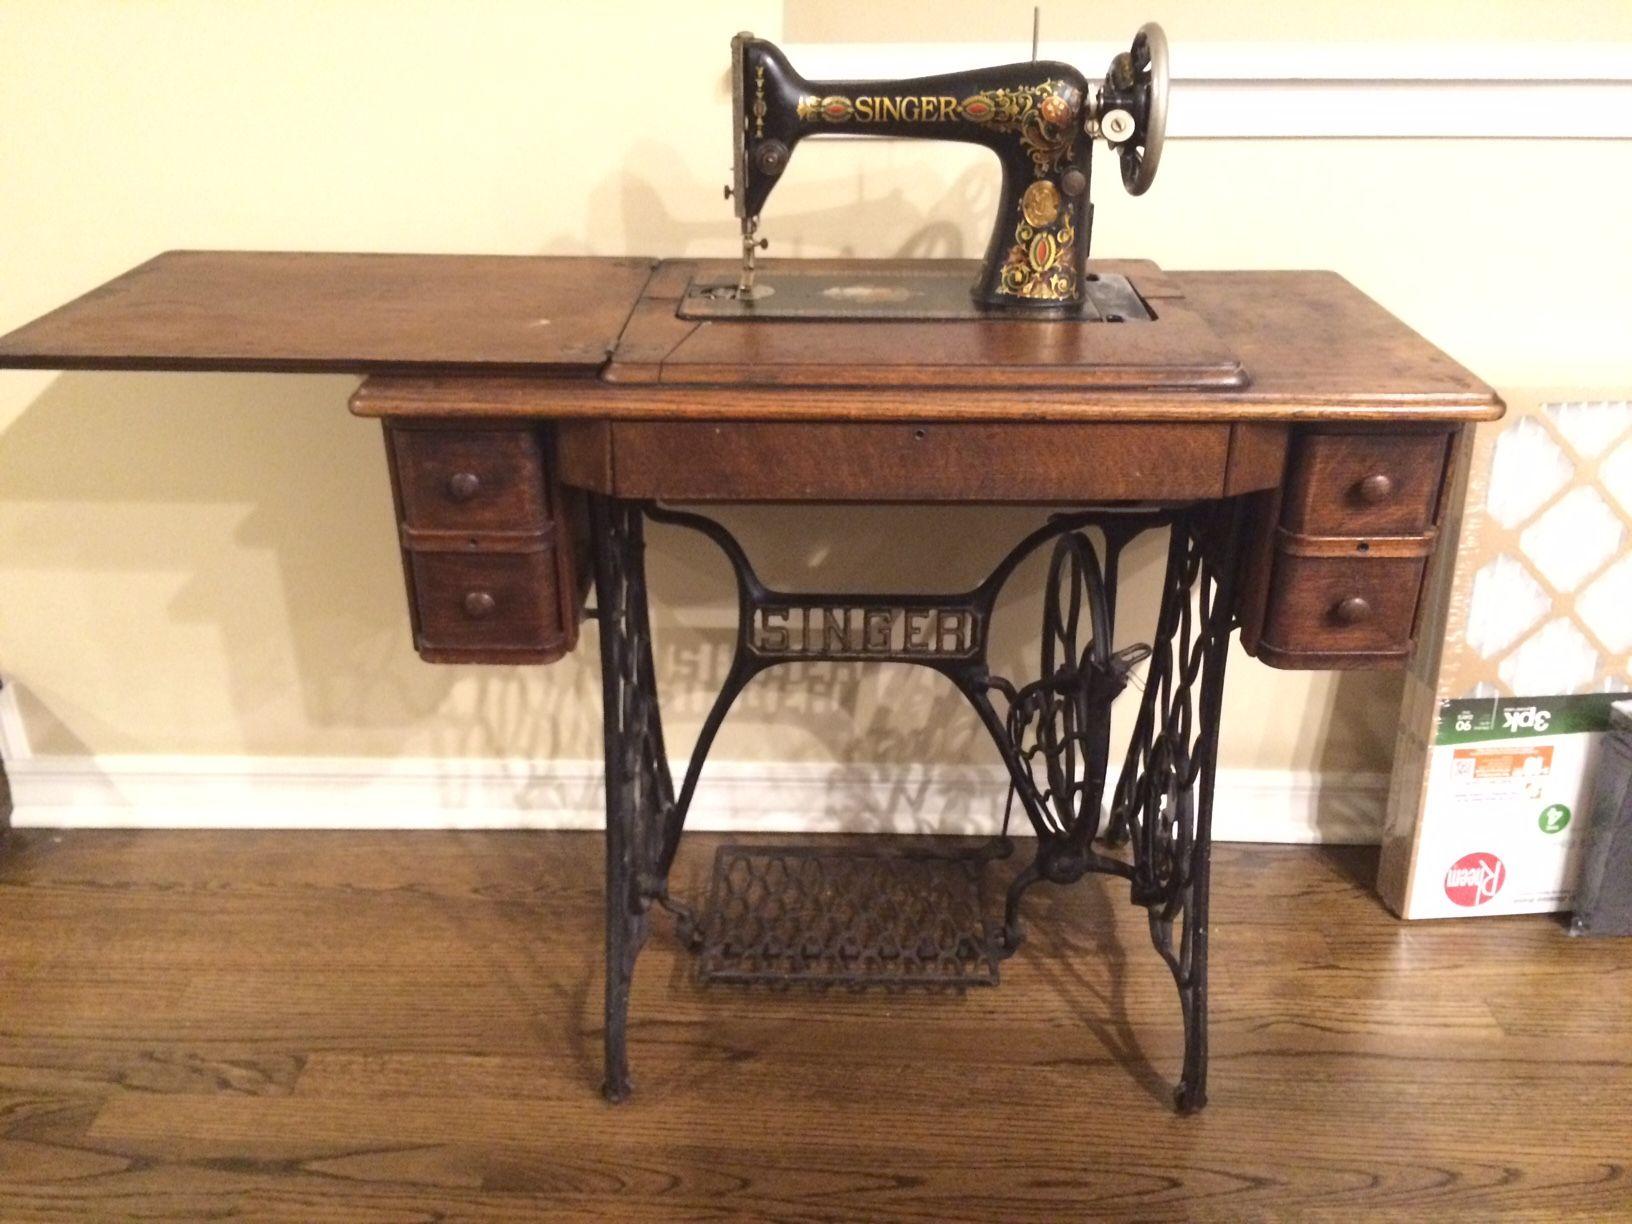 Vintage Singer Sewing Machine Table. Craigslist. Dining ...